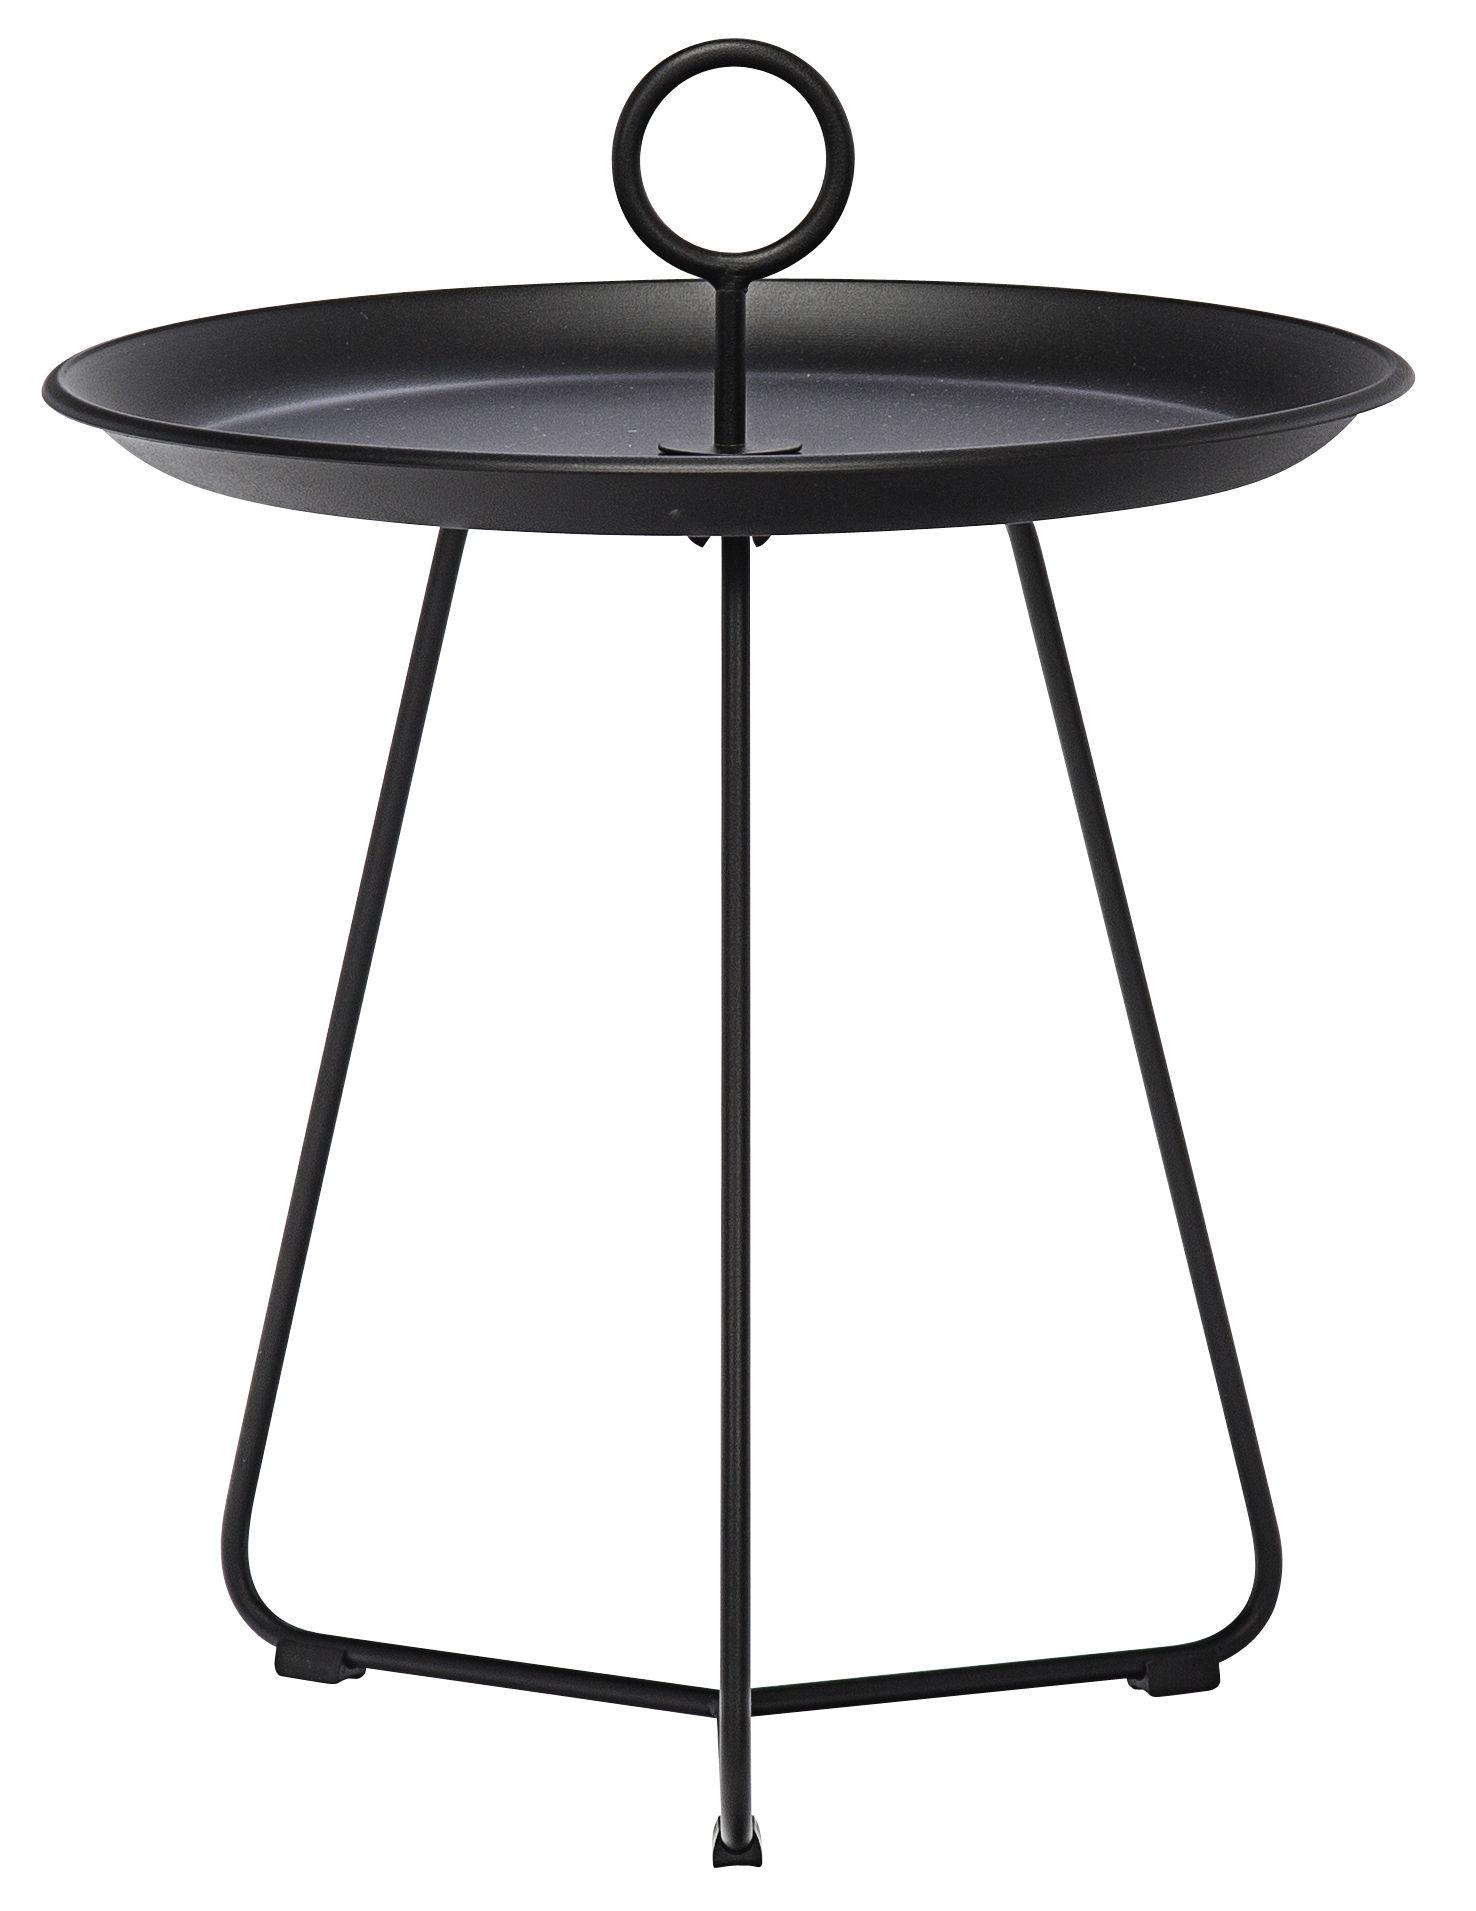 Arredamento - Tavolini  - Tavolino basso Eyelet Small / Ø 45 x H 46,5 cm - Houe - Nero - Metallo rivestito in resina epossidica